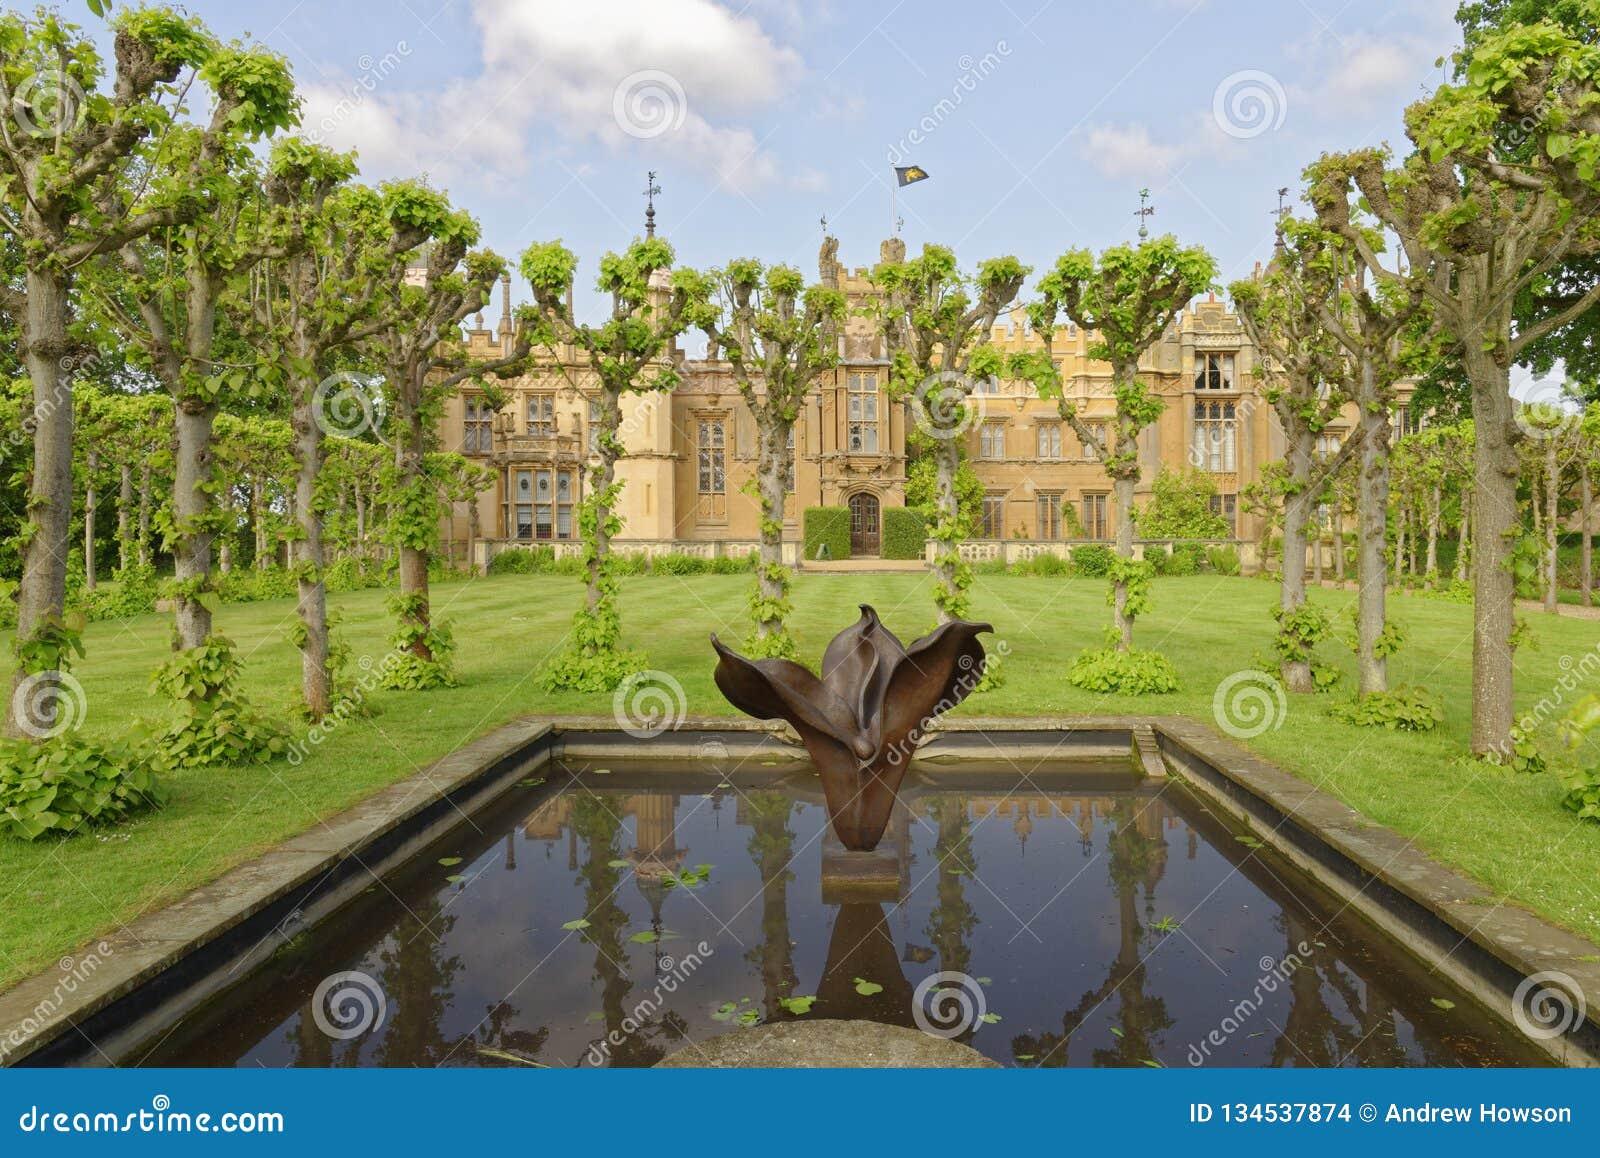 Engelsk trädgård, knebworthhus, England beskurit